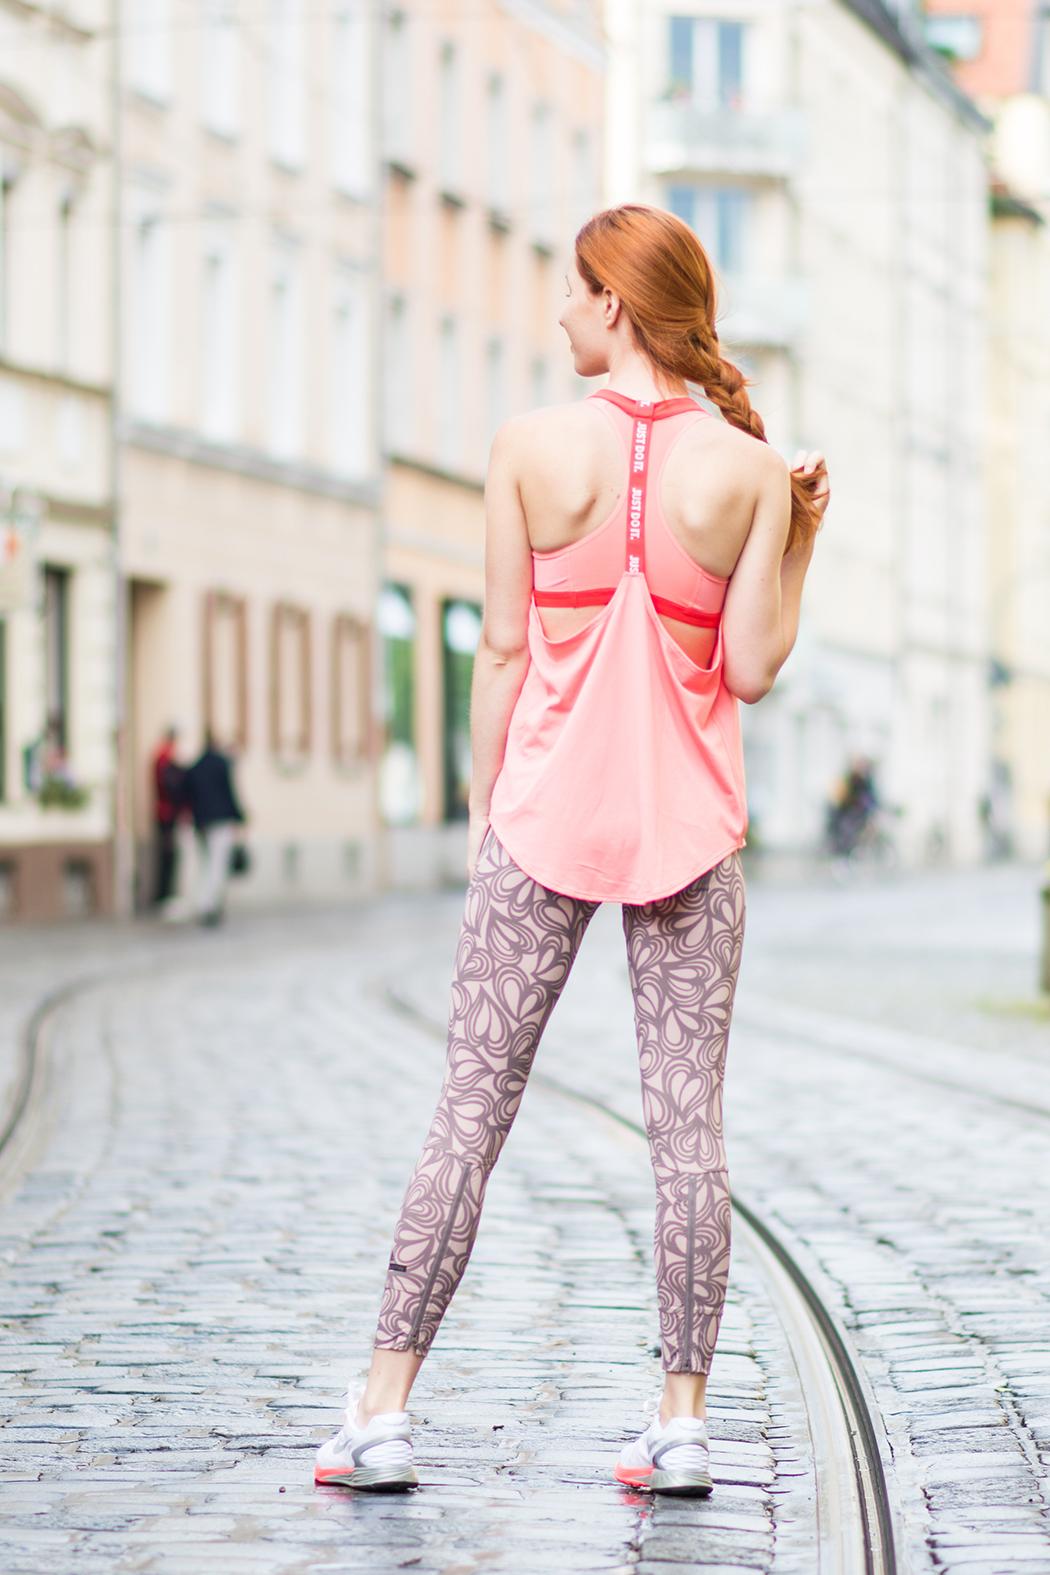 Fitnessblog-Fitnessblogger-München-Deutschland-Lindarella-Nike-Training-Stella_Mc_Cartney-Tights-Sportklamotten-Fitness-Blog-Laufblog-Sportblog-Sportblogger-2